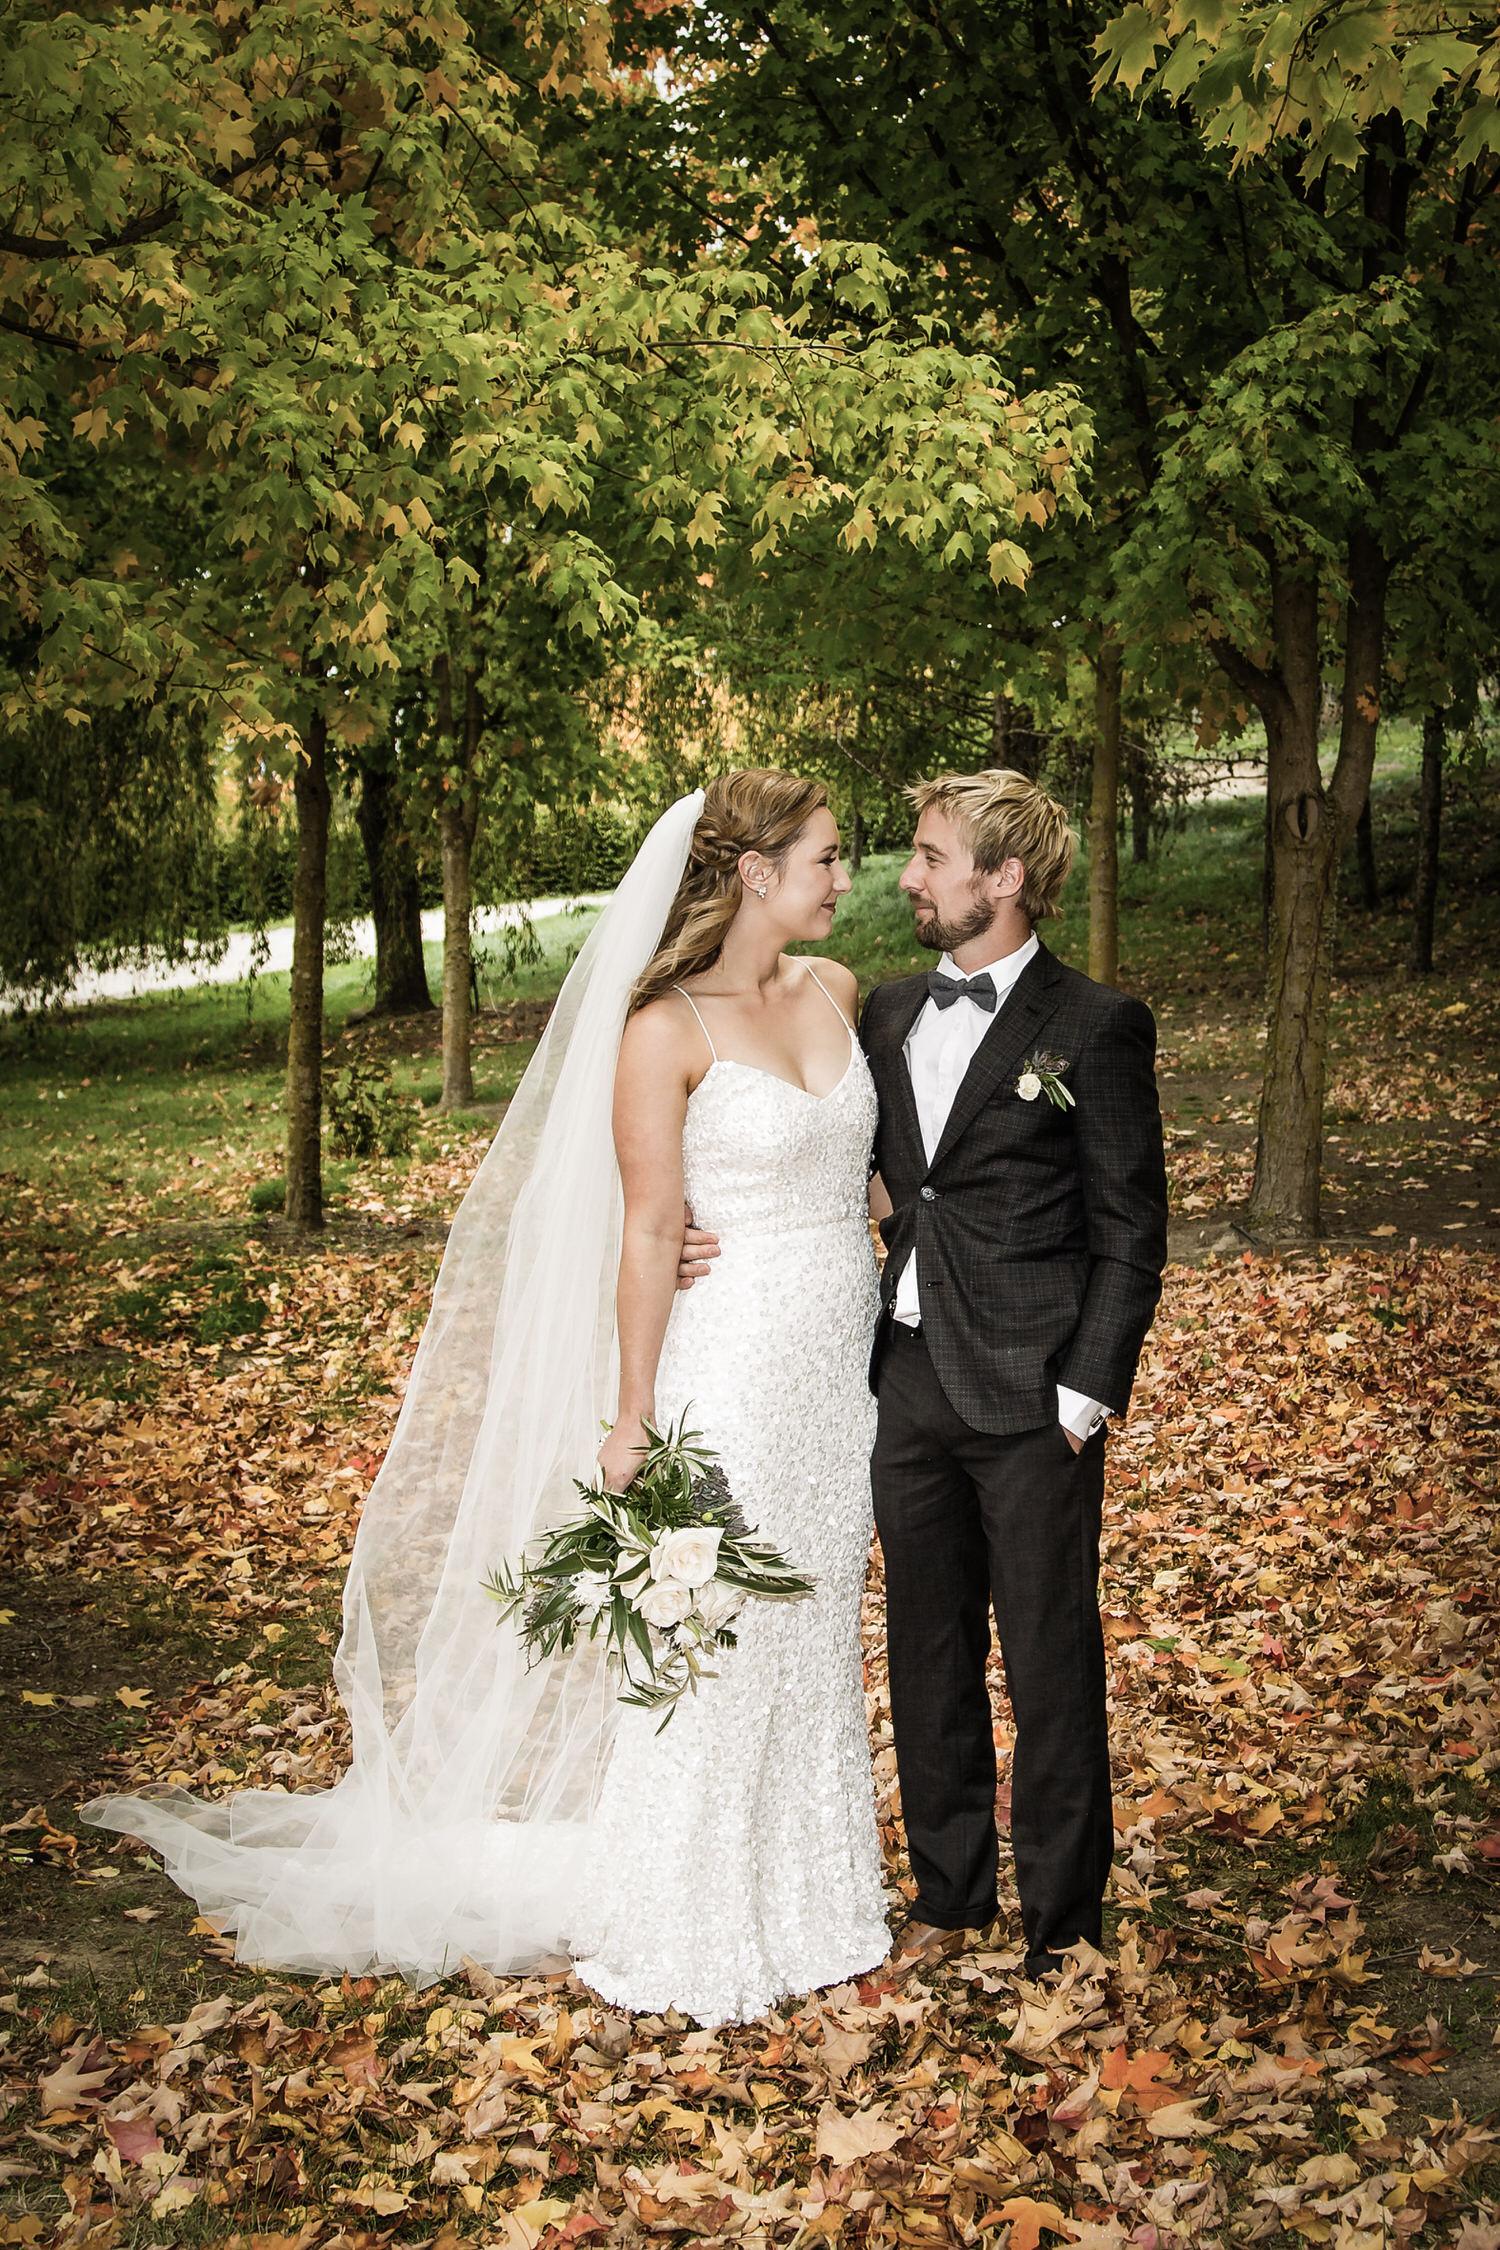 017-bride-groom-autumn-colours.jpg